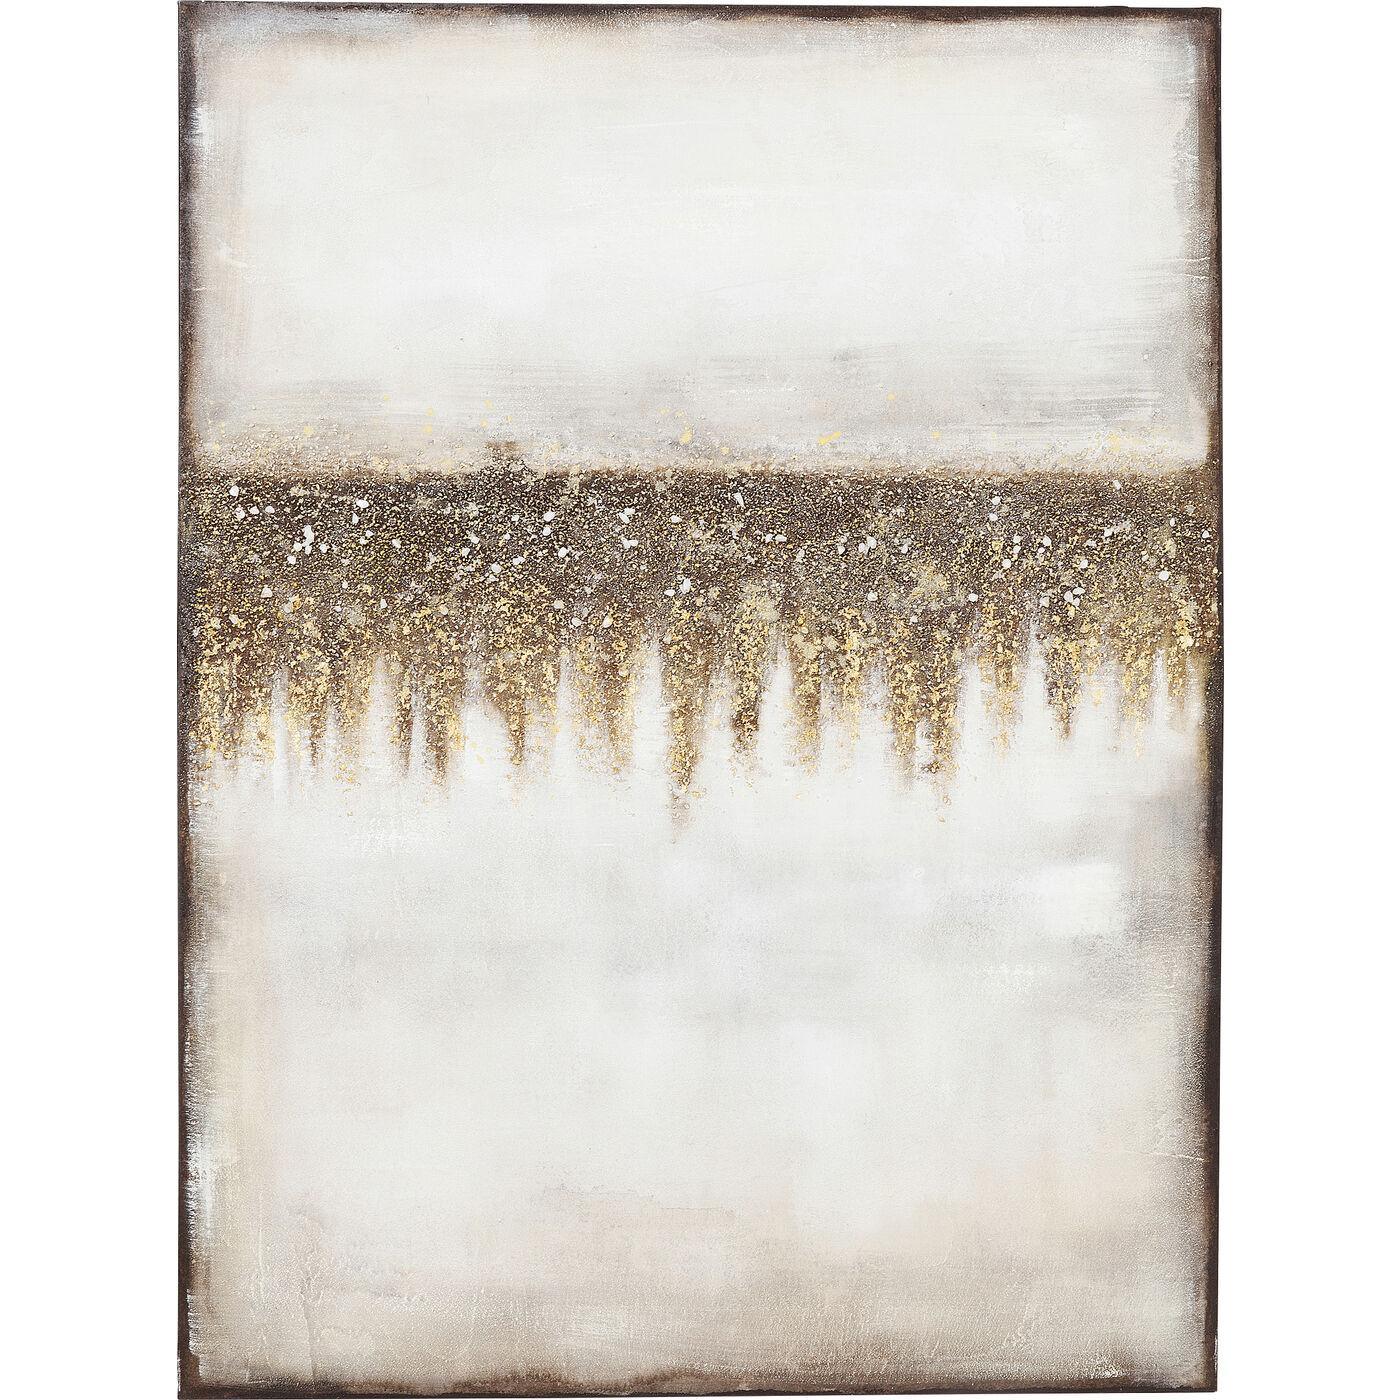 Acrylbild Abstract Fields 120x90